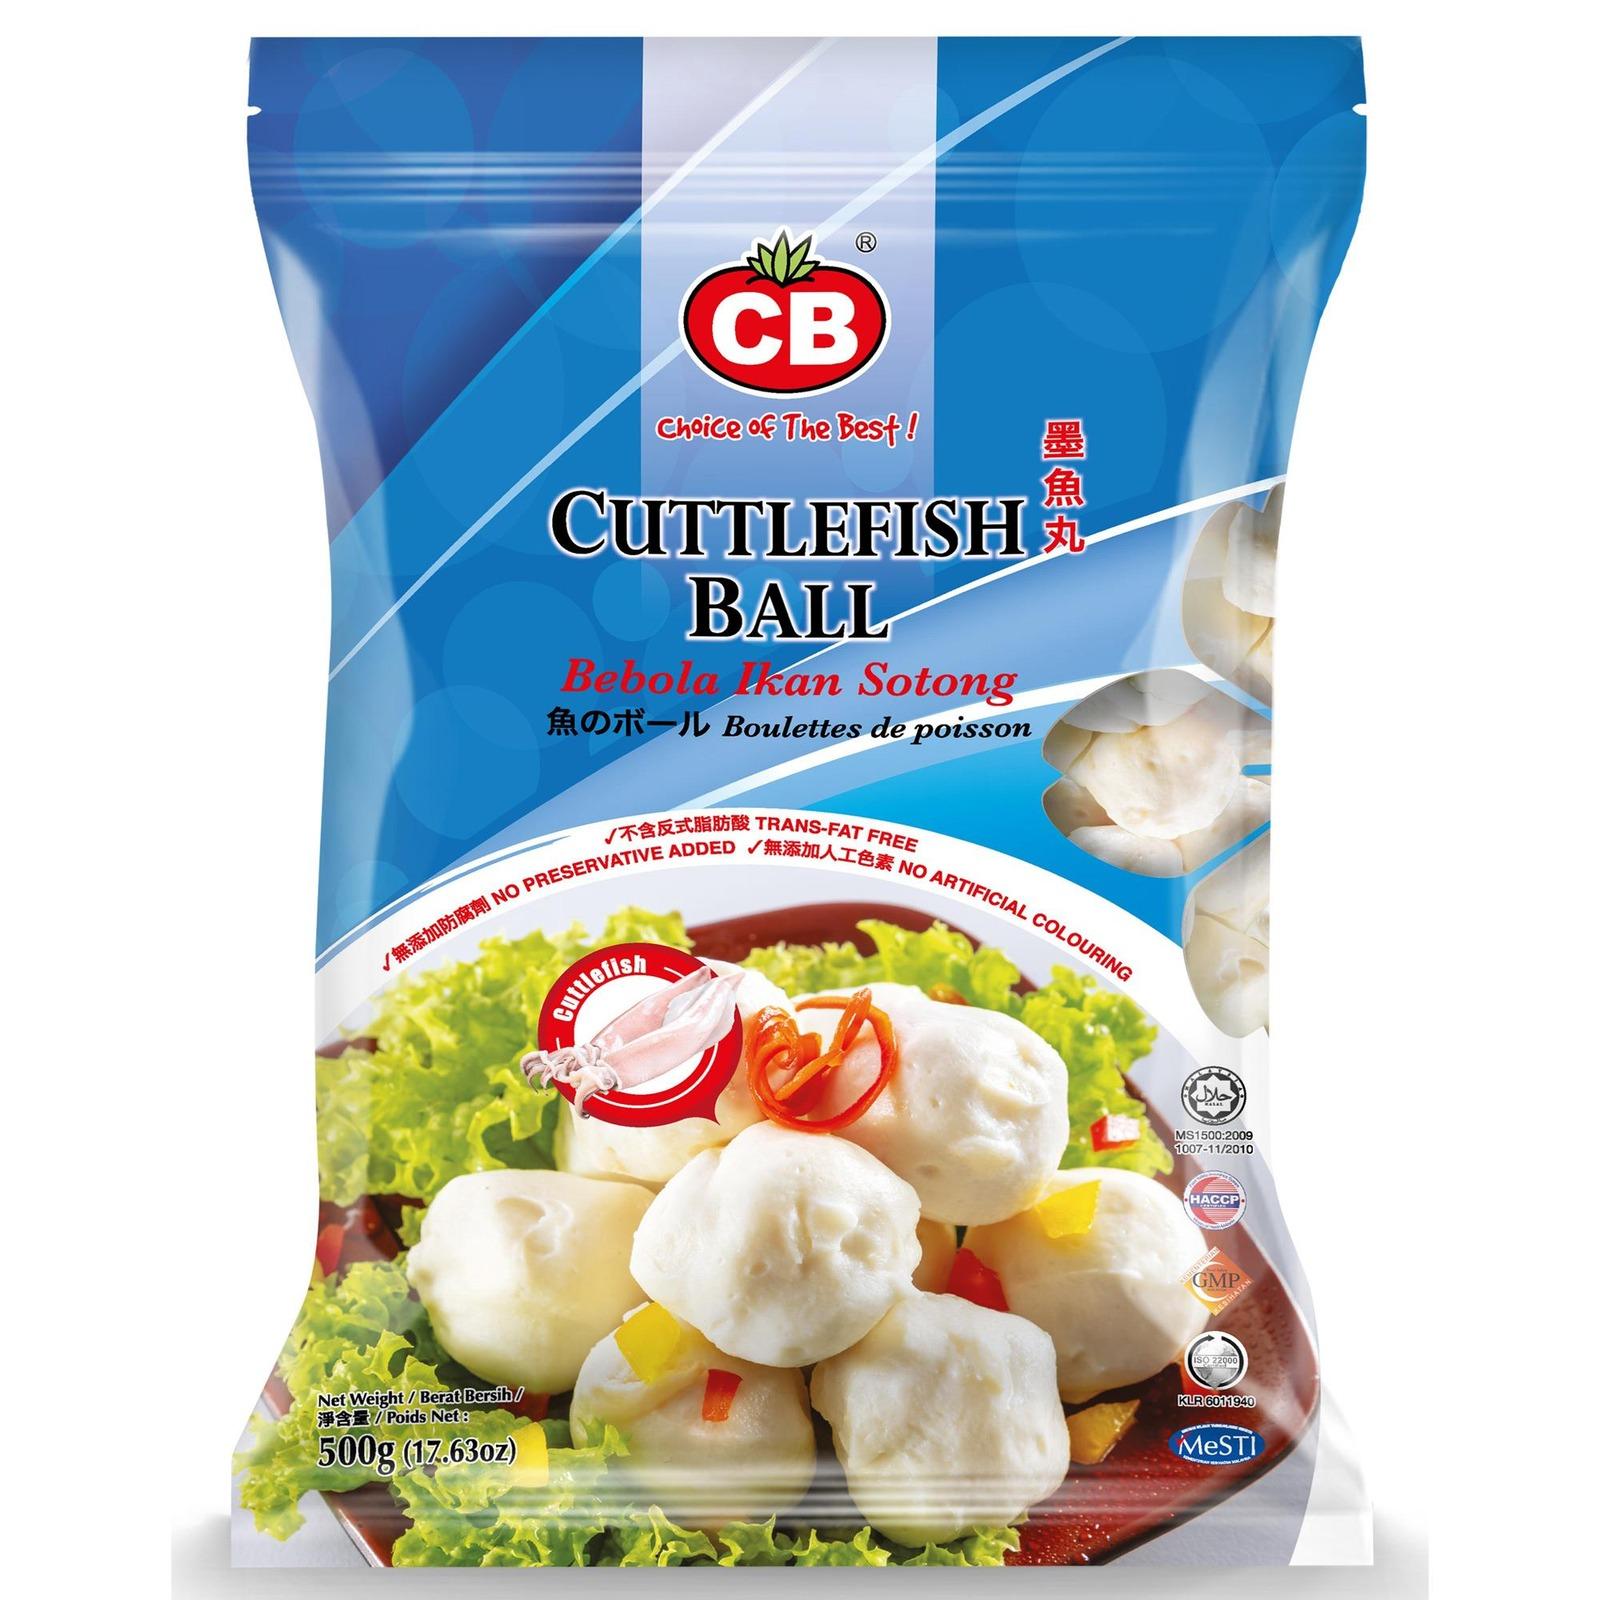 CB Cuttlefish Ball 23Pcs